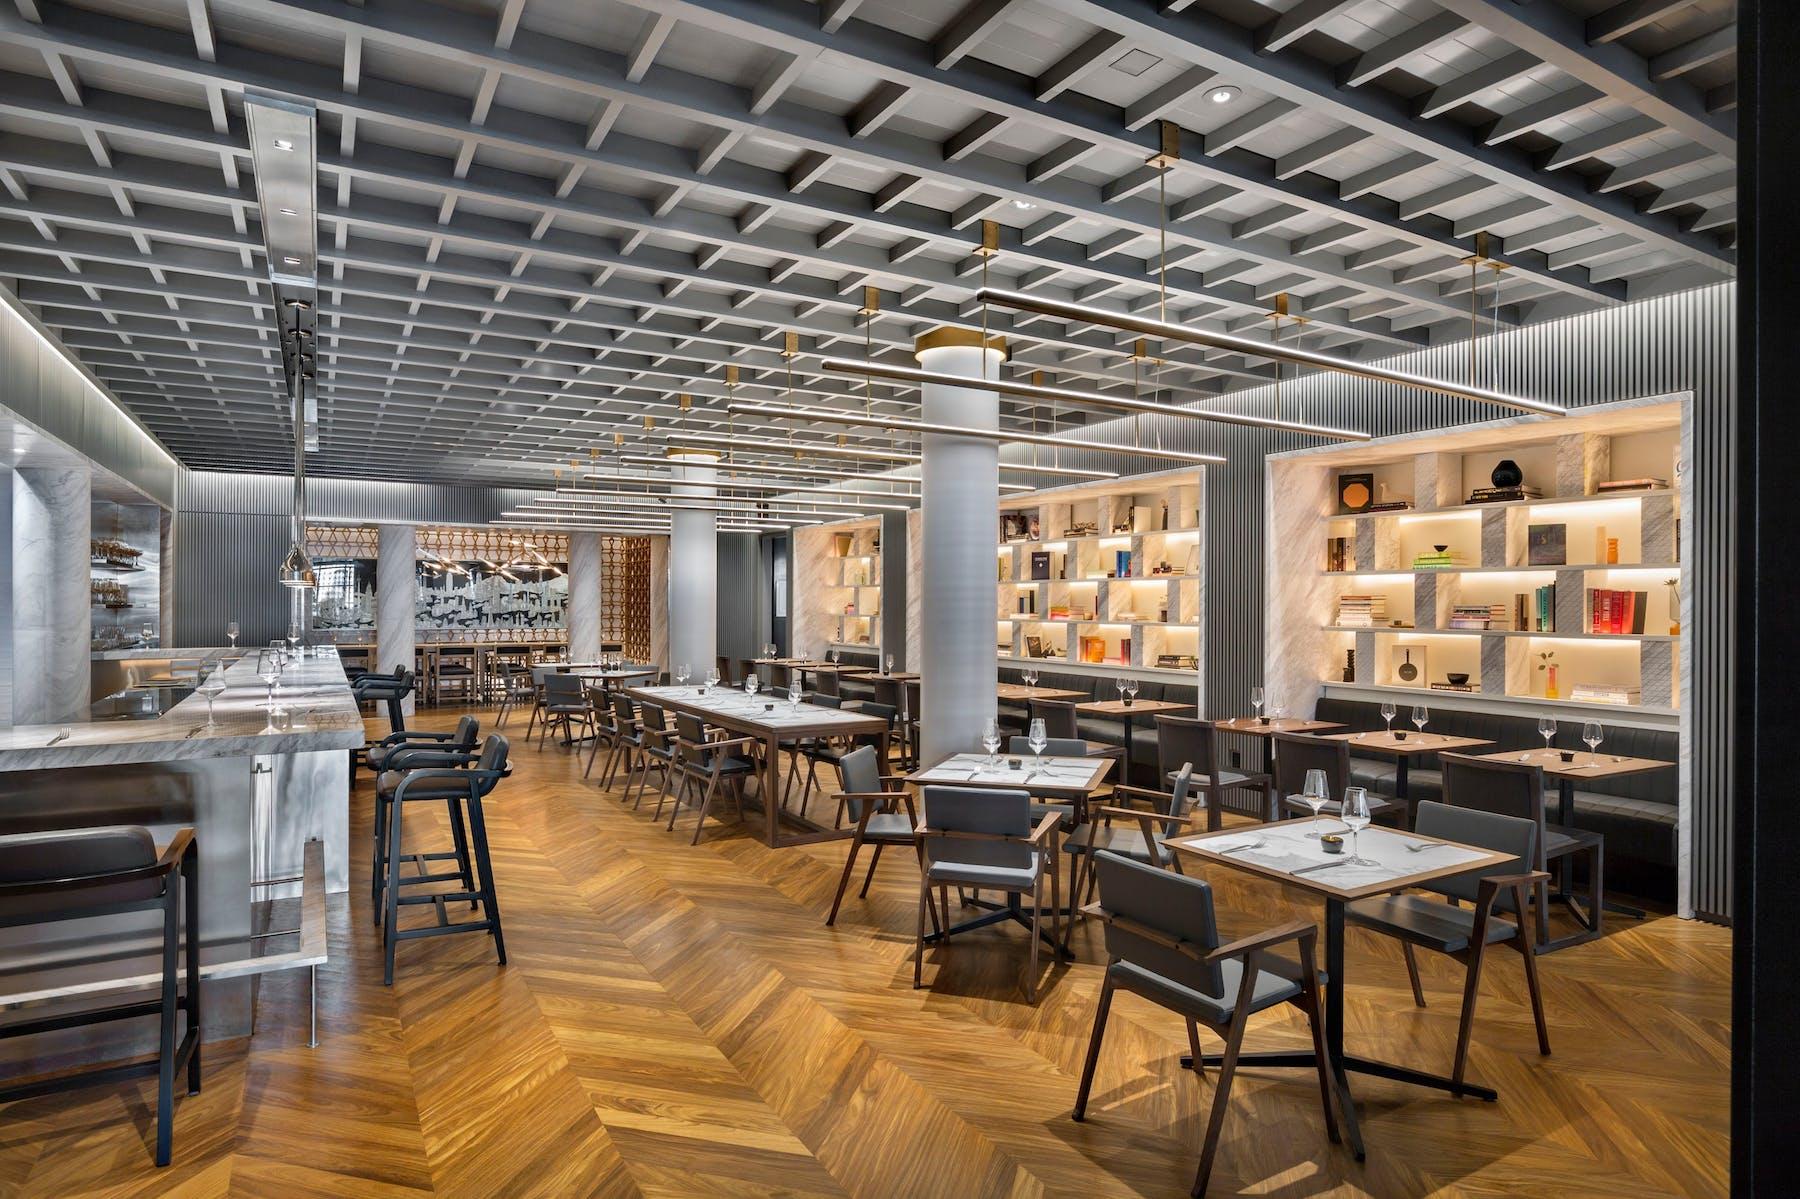 INTERSECT BY LEXUS - Restaurants